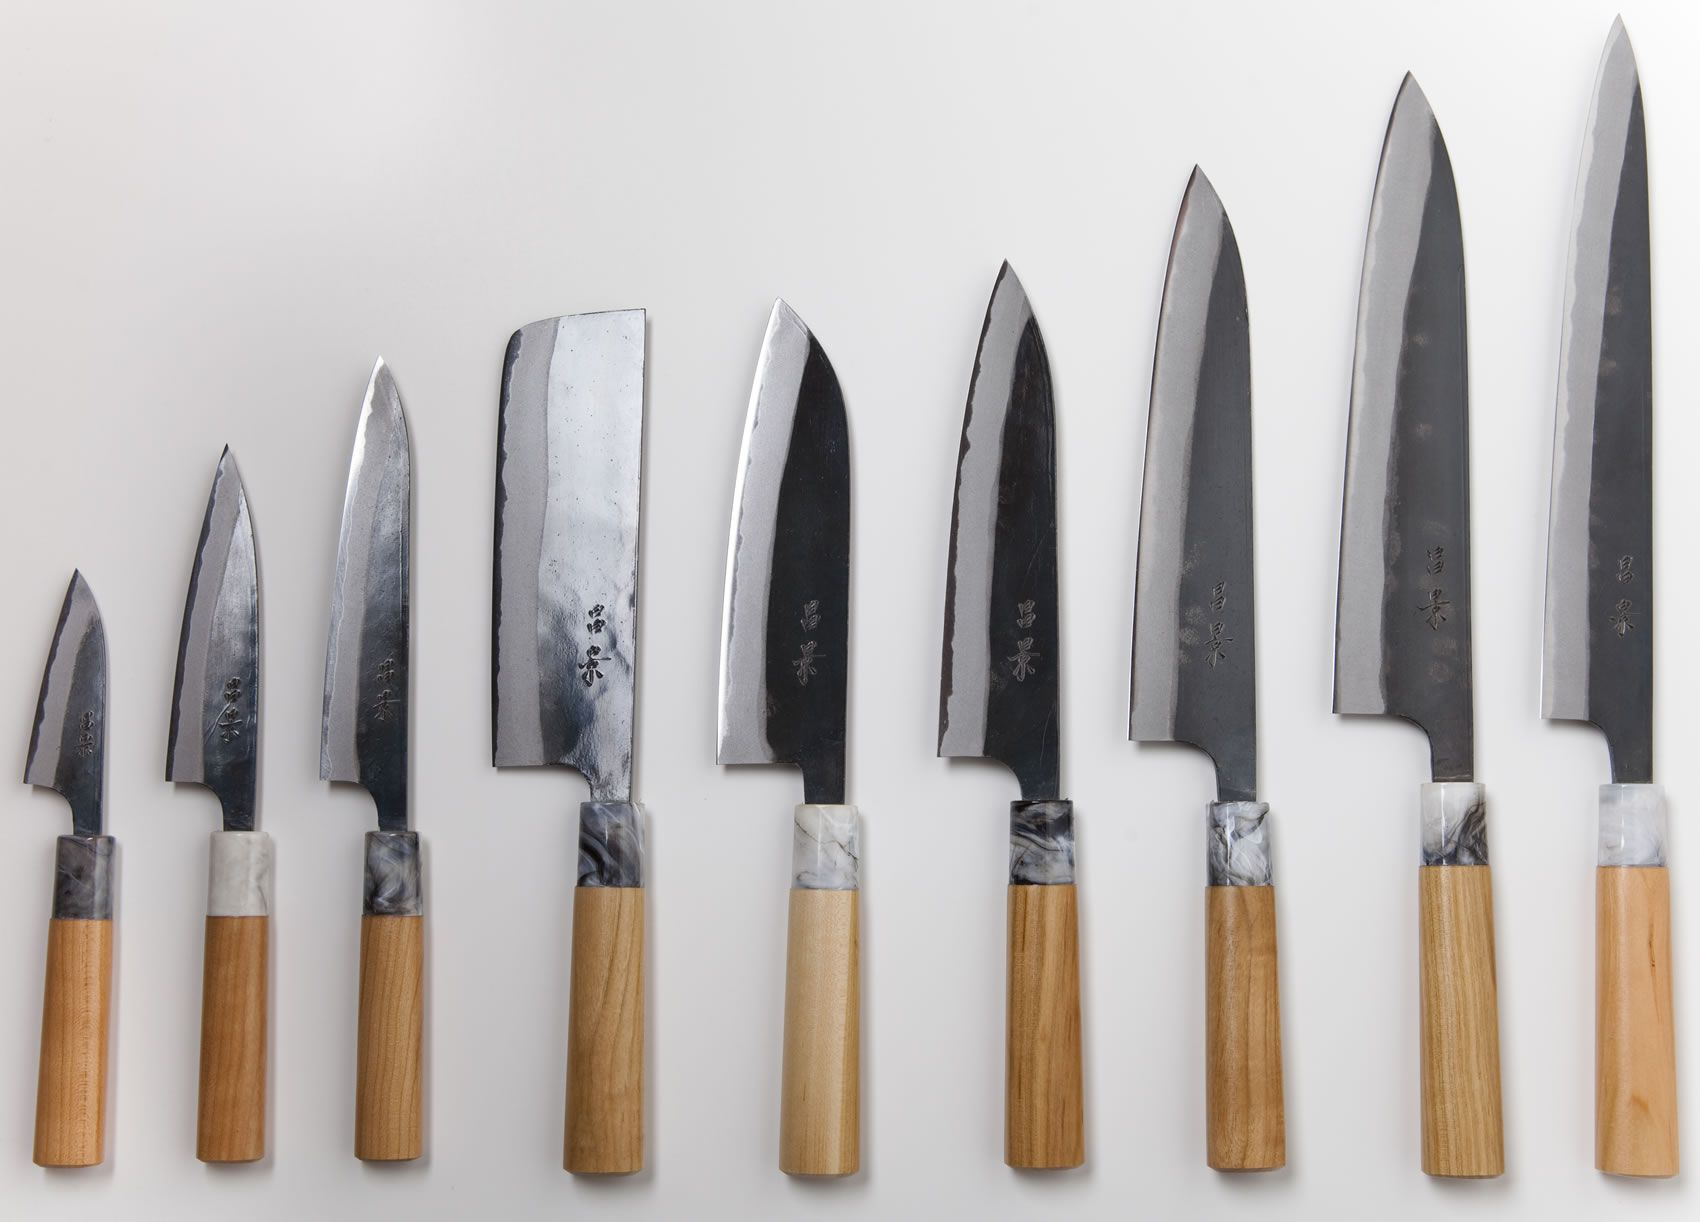 Masakage Mizu line by Katsushige Anryu | Cooking - tools of the ...